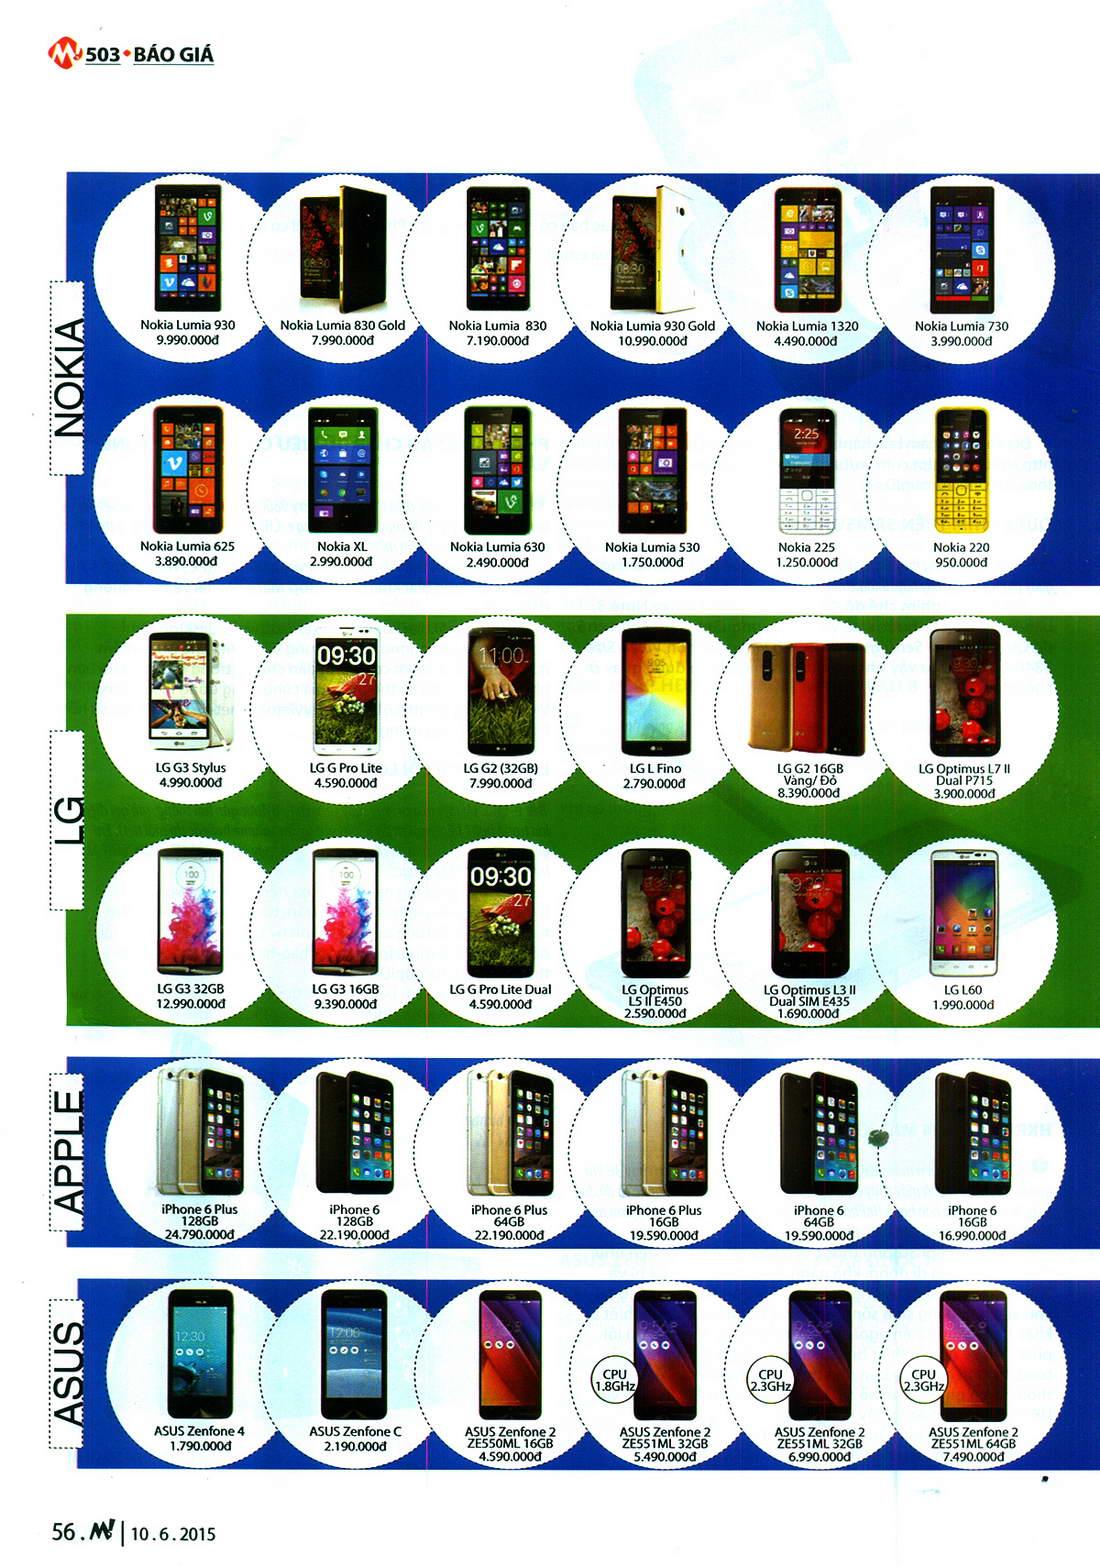 EChip Mobile 503 tapchicntt.com